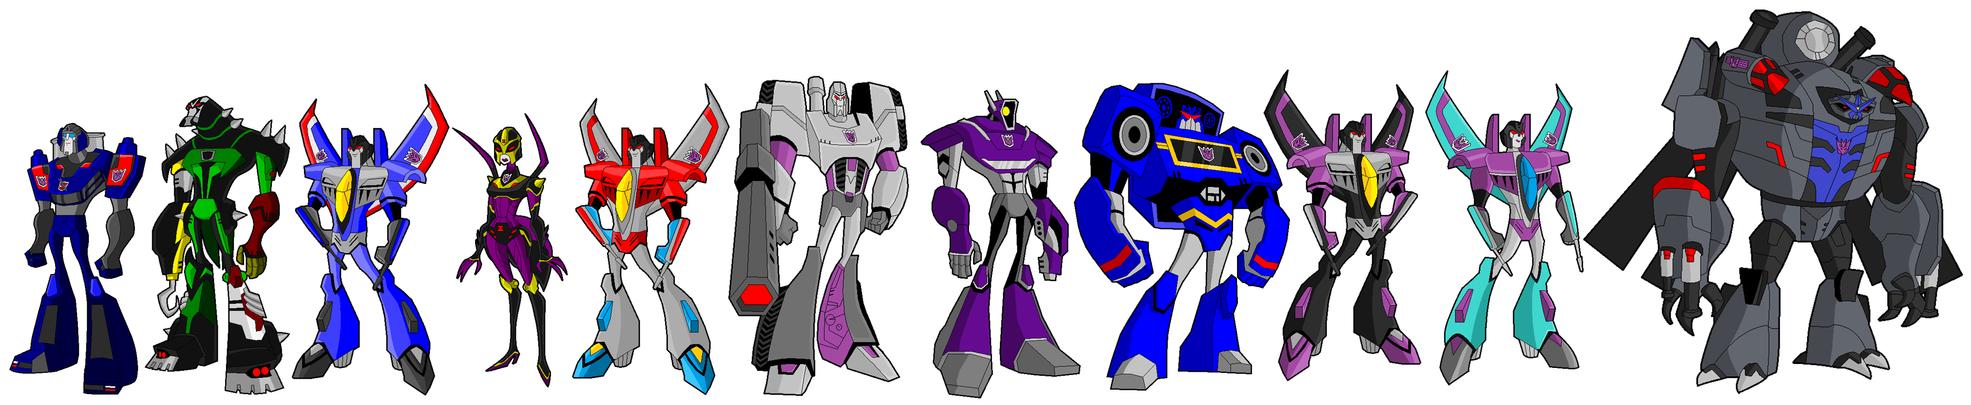 transformers: legend season 1 decepticonsskyscream1 on deviantart